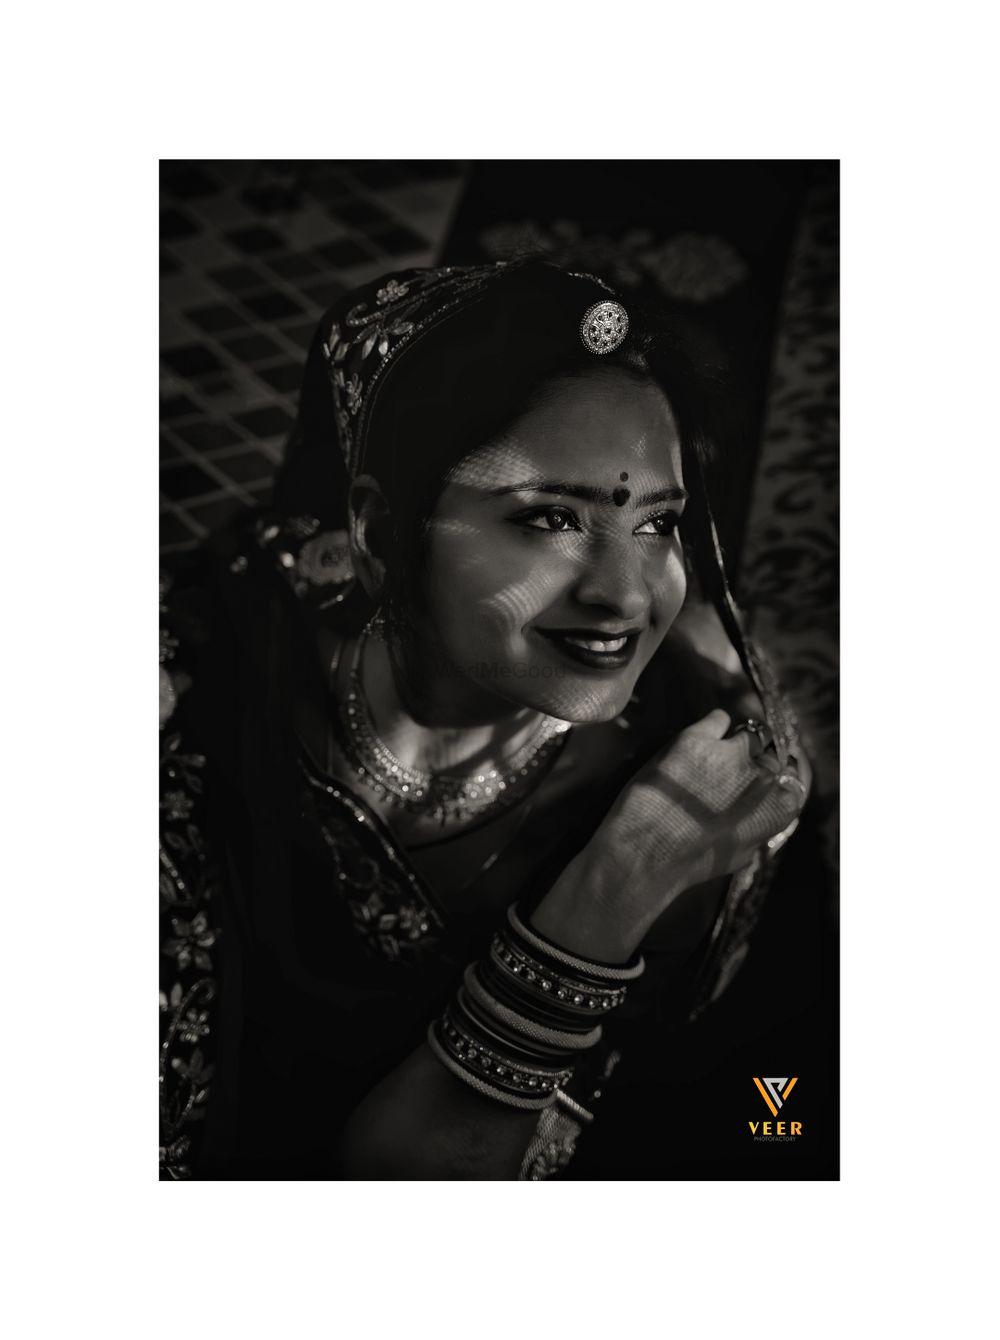 Photo From Wedding Album - By Veer Photofactory